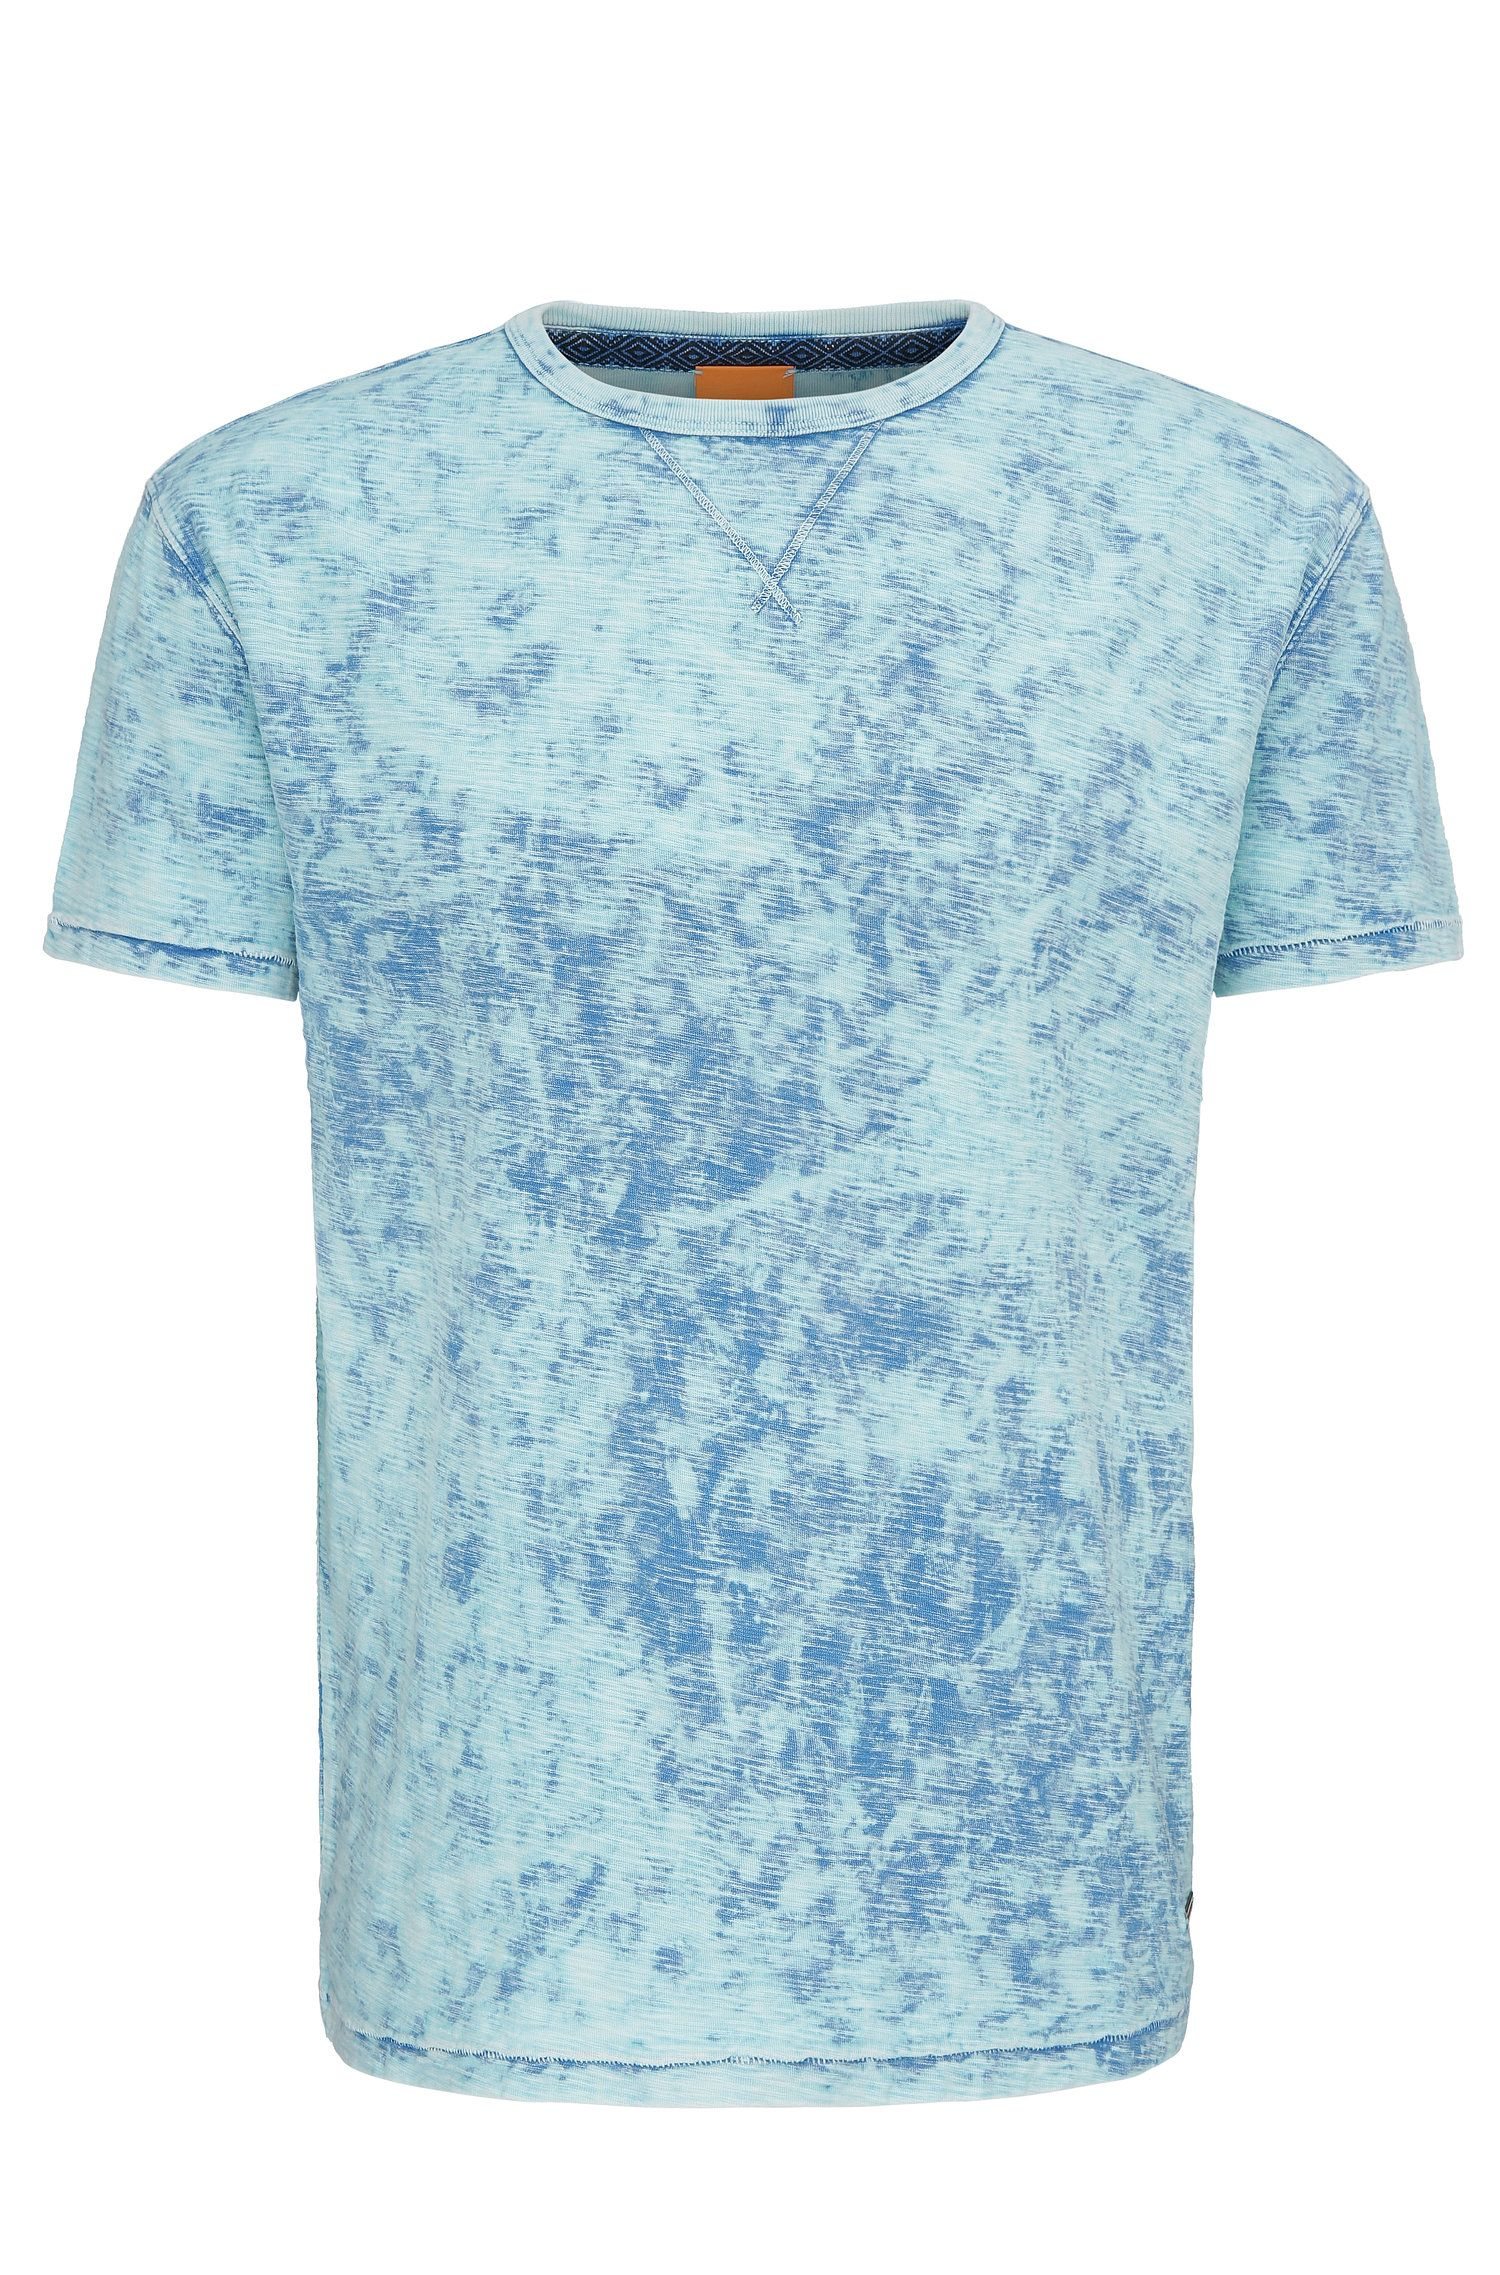 Heathered Cotton T-Shirt | Tay